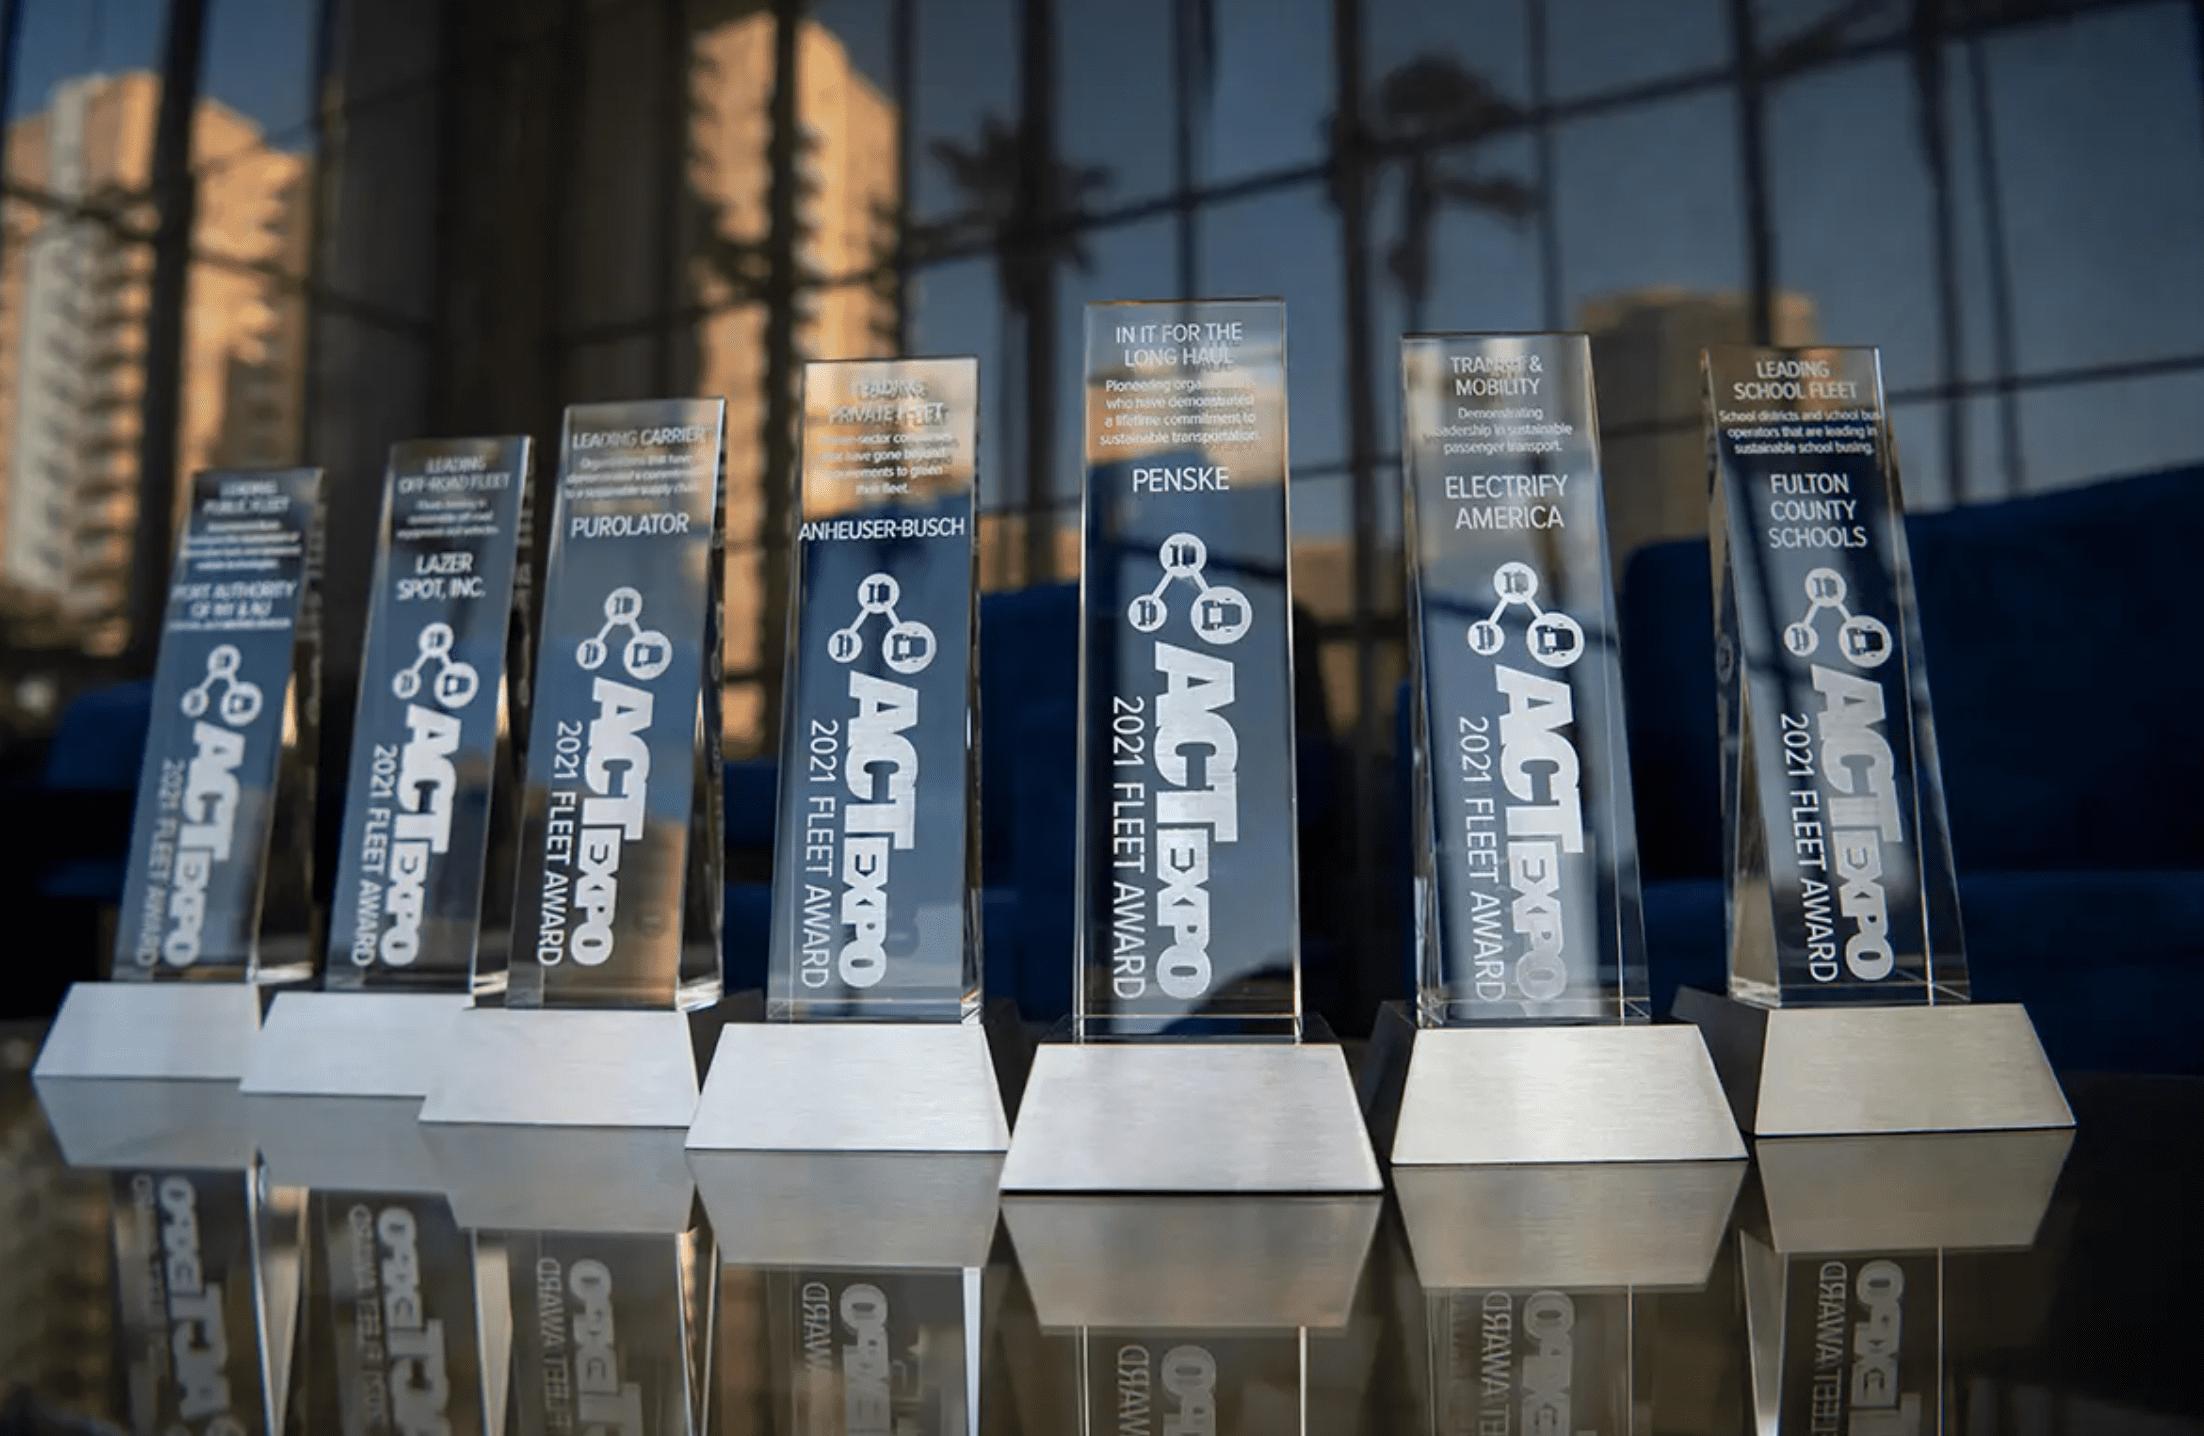 Fleet Awards 2021